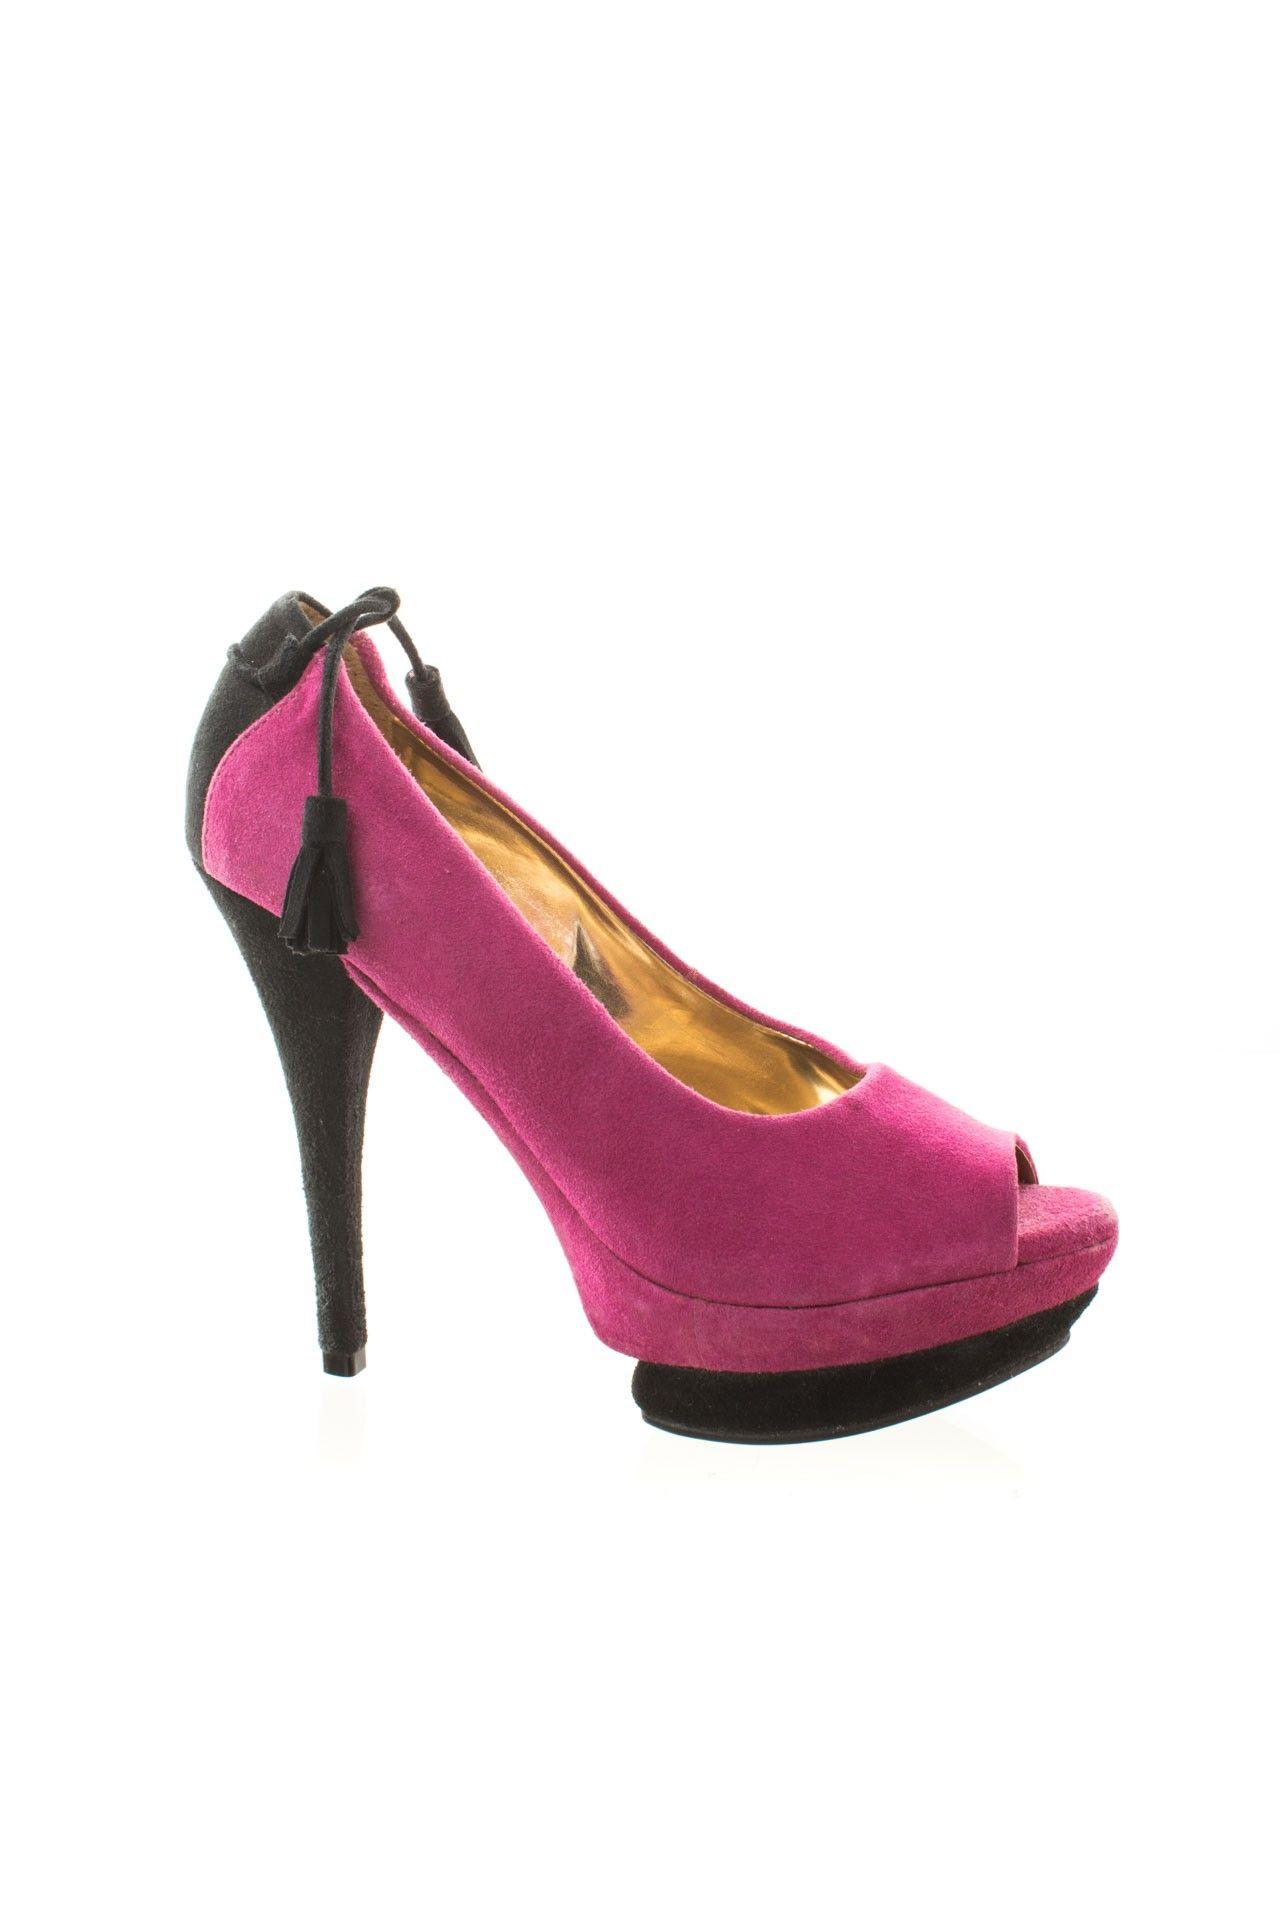 Lança Perfume - Sapato Rosa Salto - Foto 1